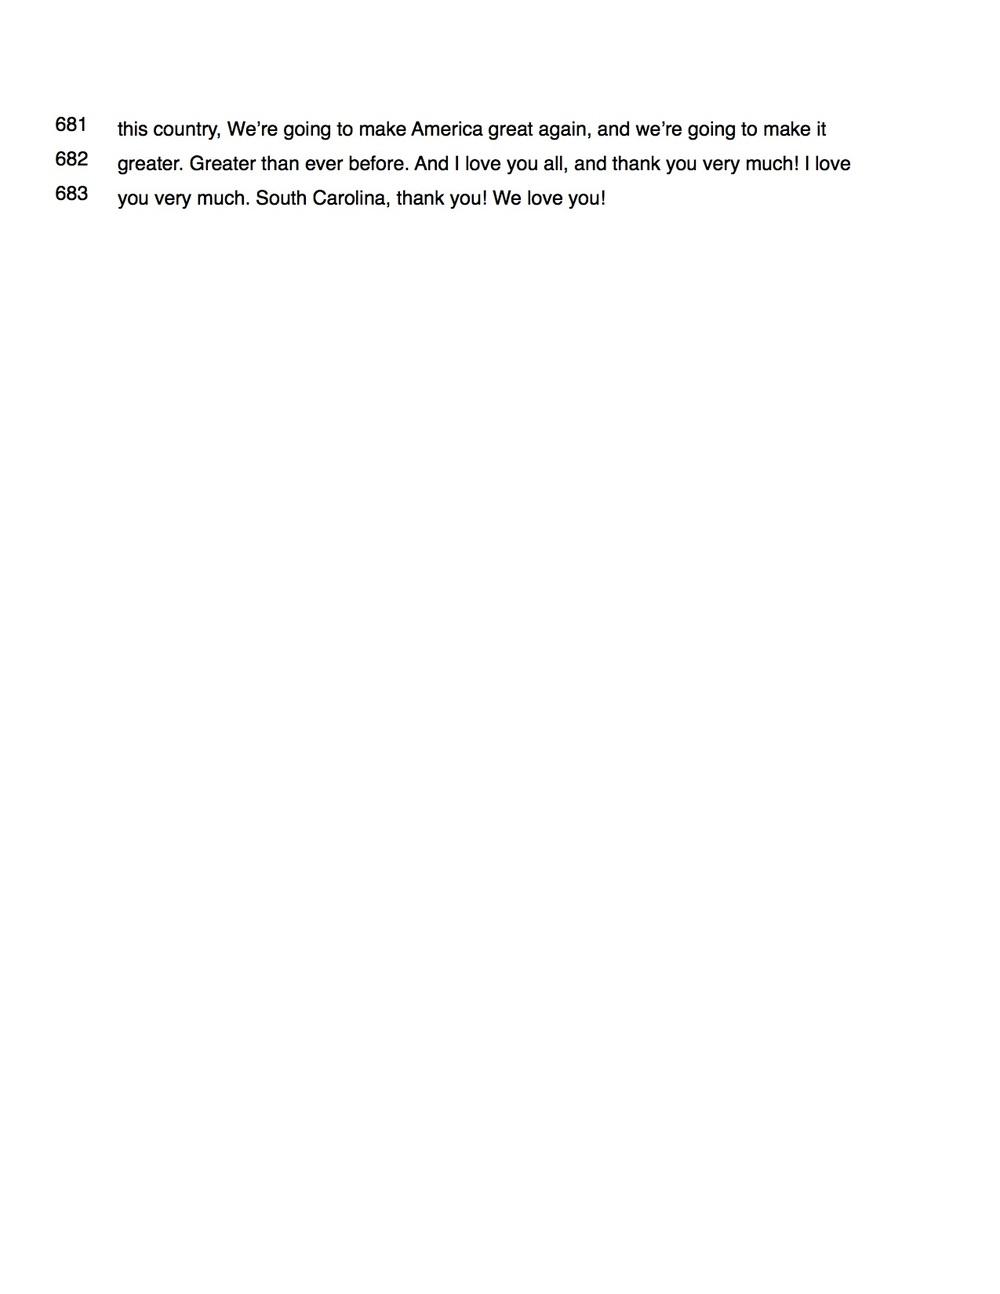 Transcript Of Trumps Yorktown Speech Areopagus